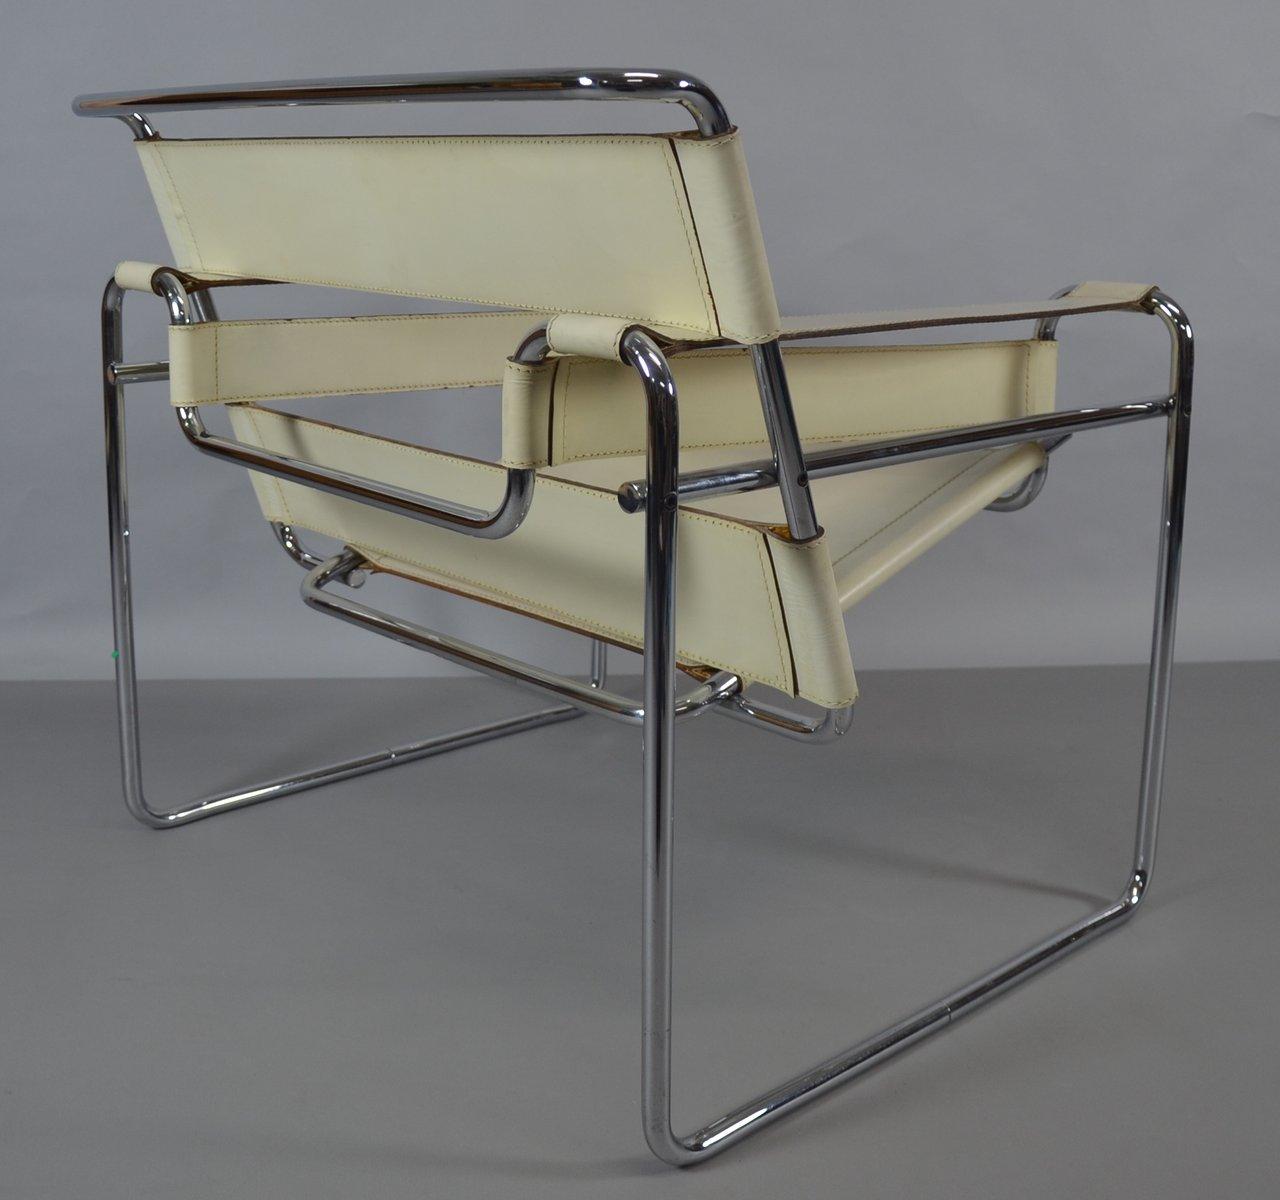 Wassily stuhl von marcel breuer f r knoll inc 1980er bei for Wassily stuhl design analyse